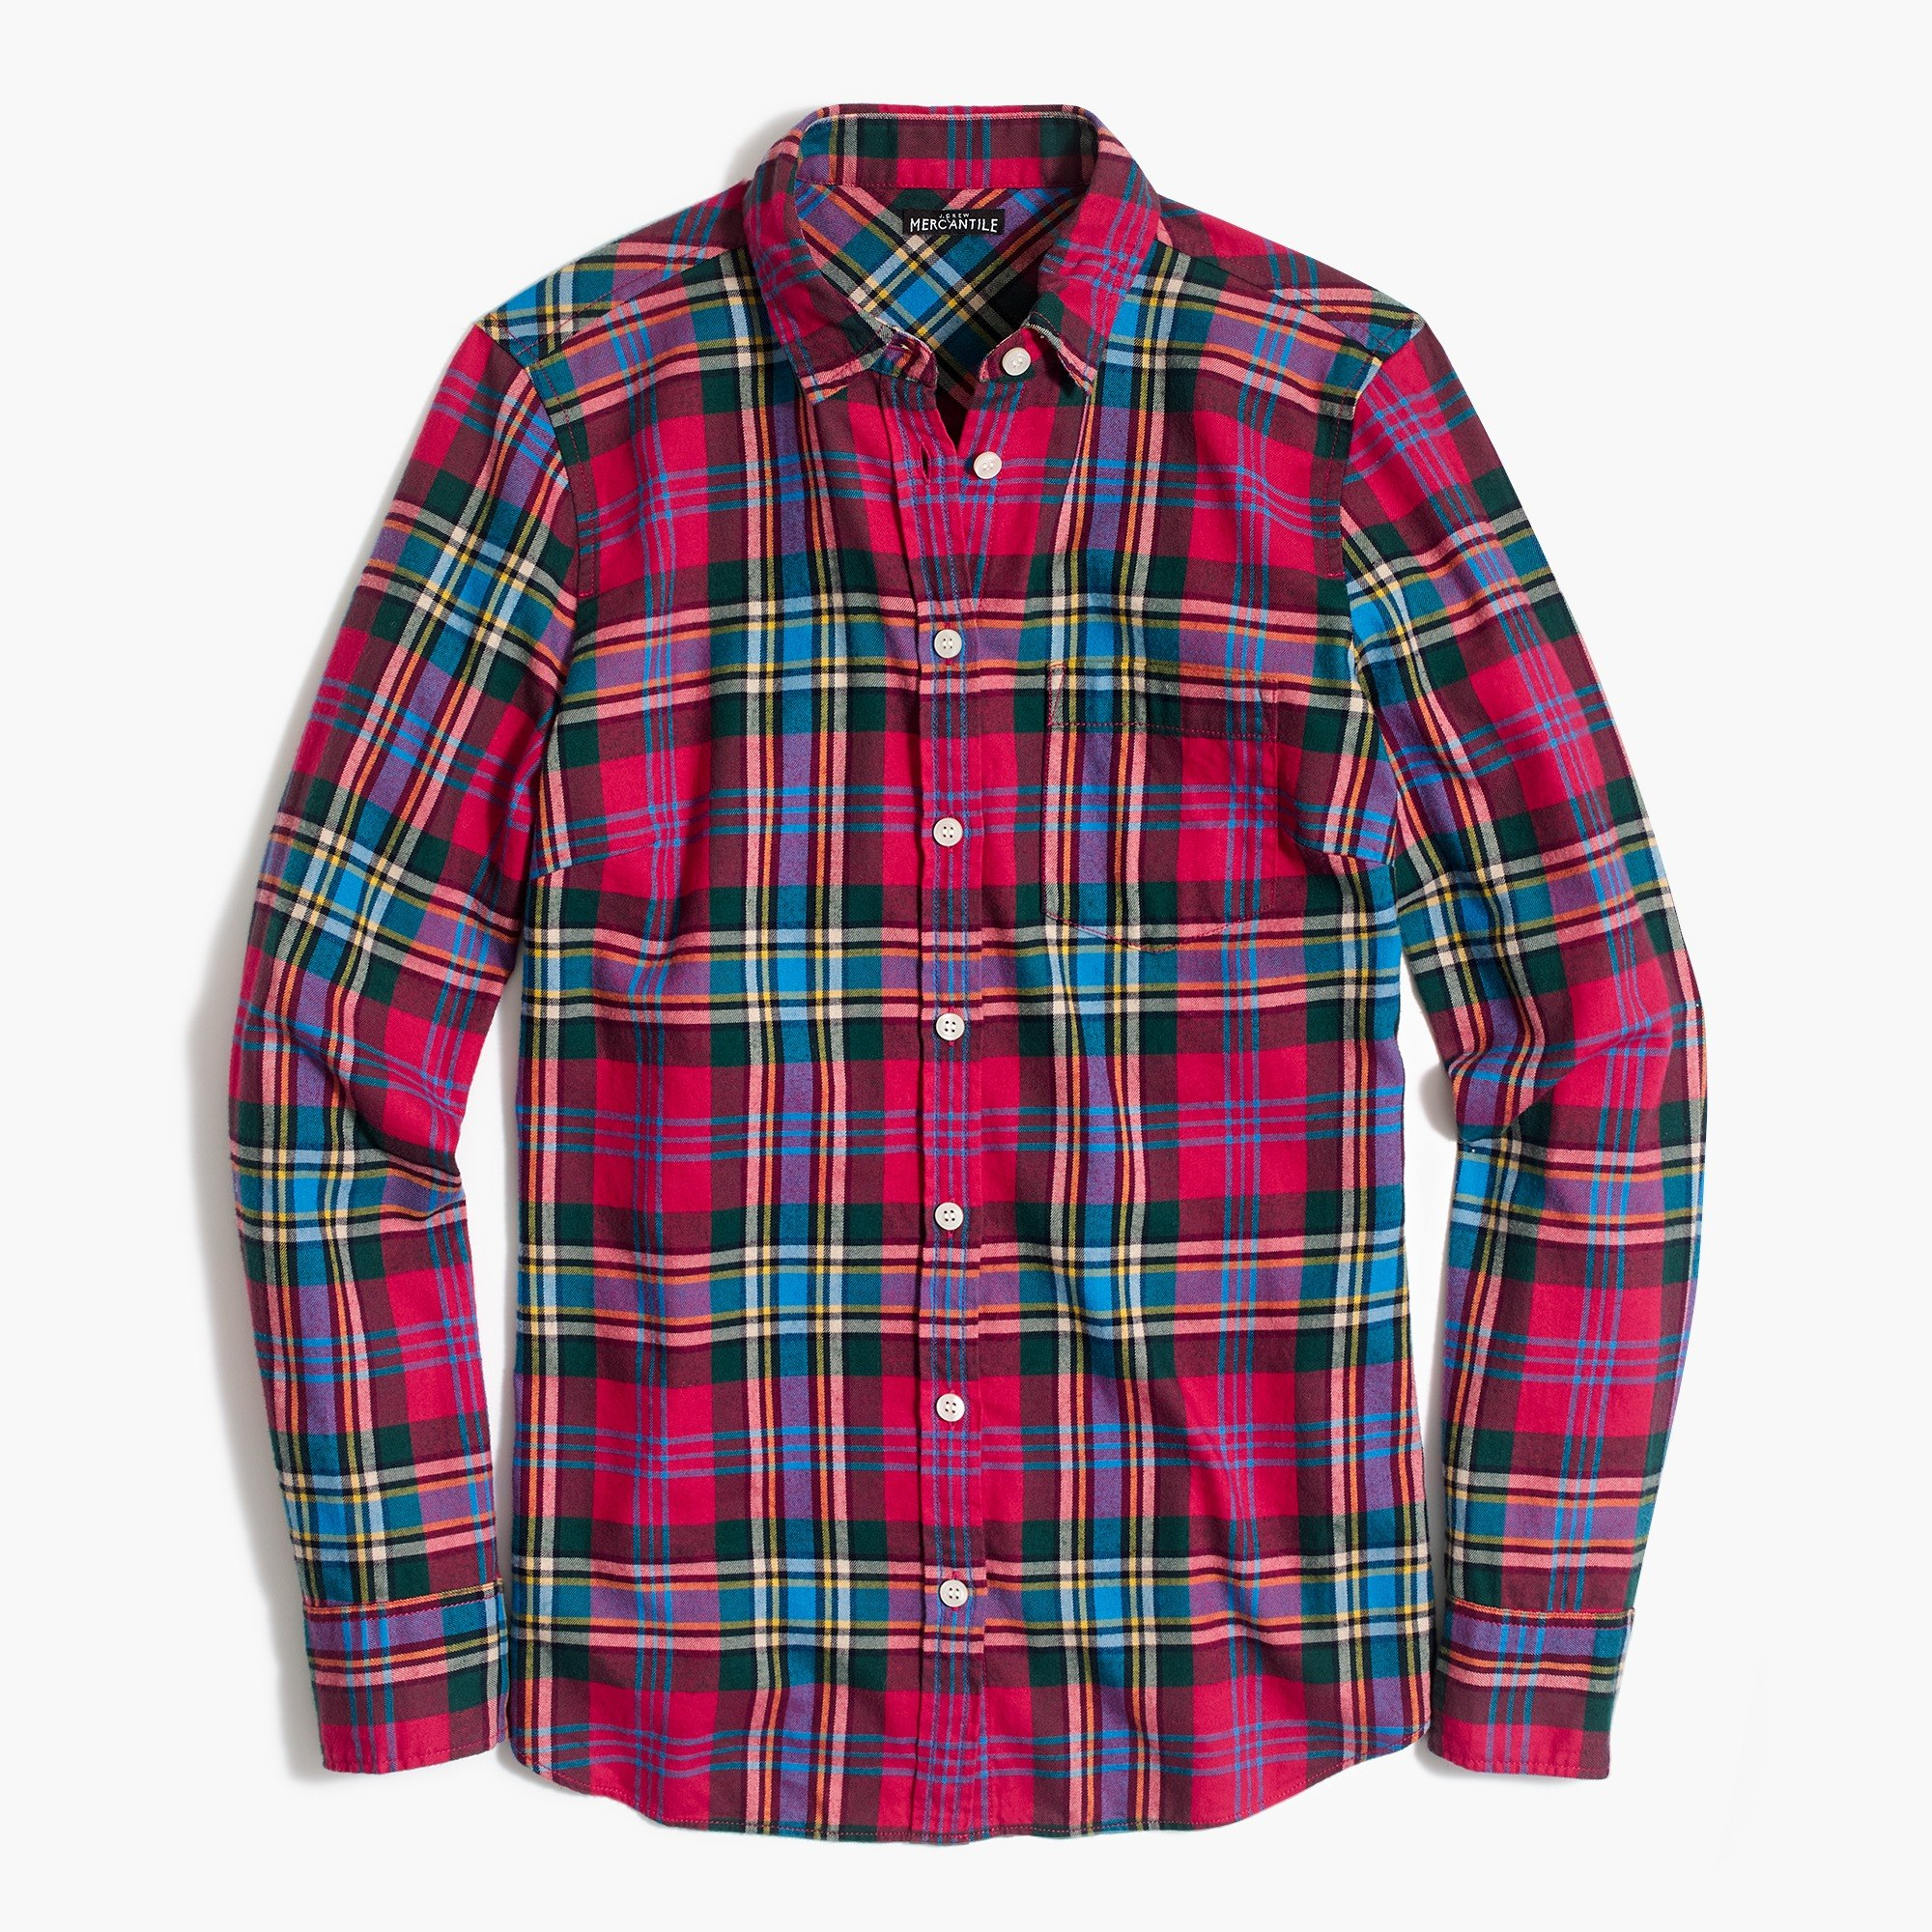 Women's Flannel Shirt - Women's Button Down Shirts | J.Crew